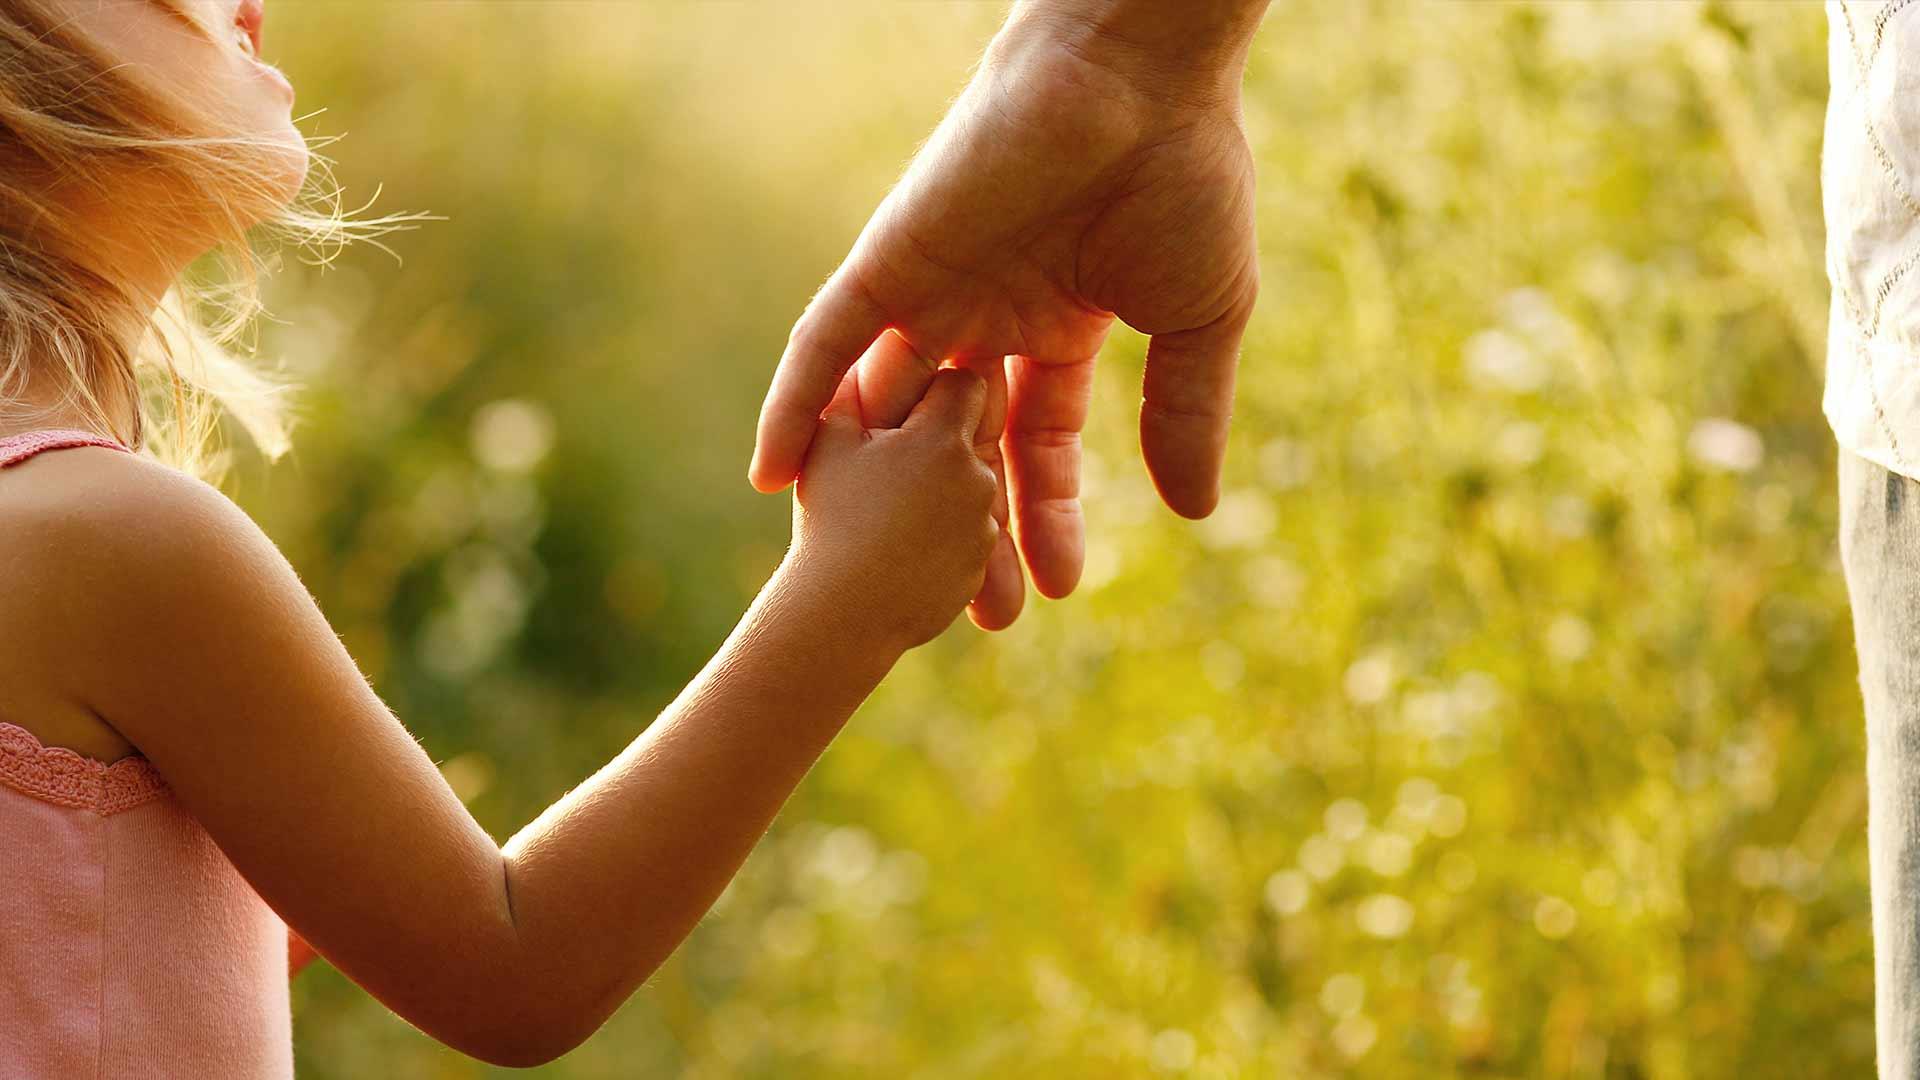 Child Arrangements and Custody Disputes